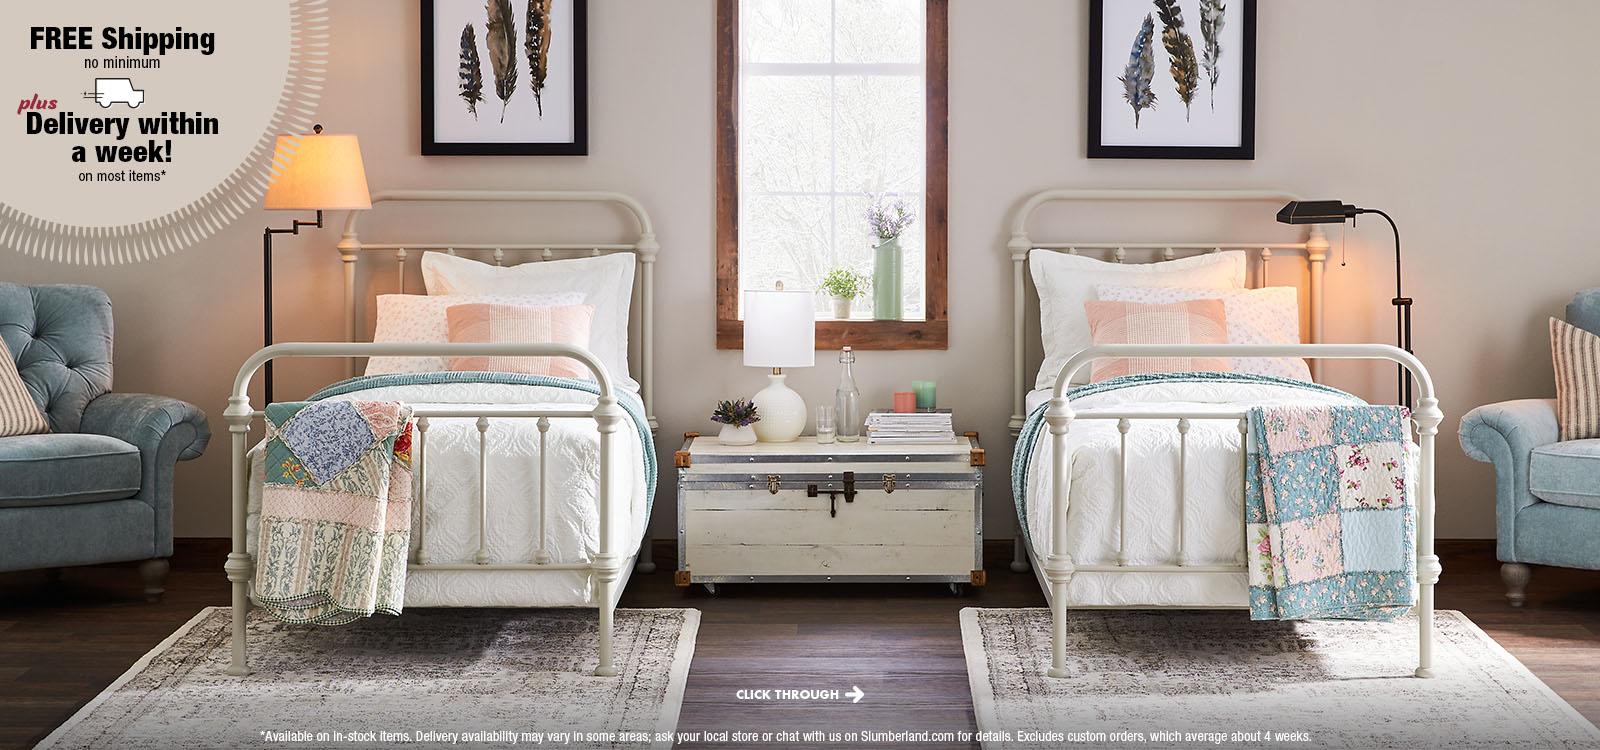 Slumberland Furniture | Slumberland Furniture